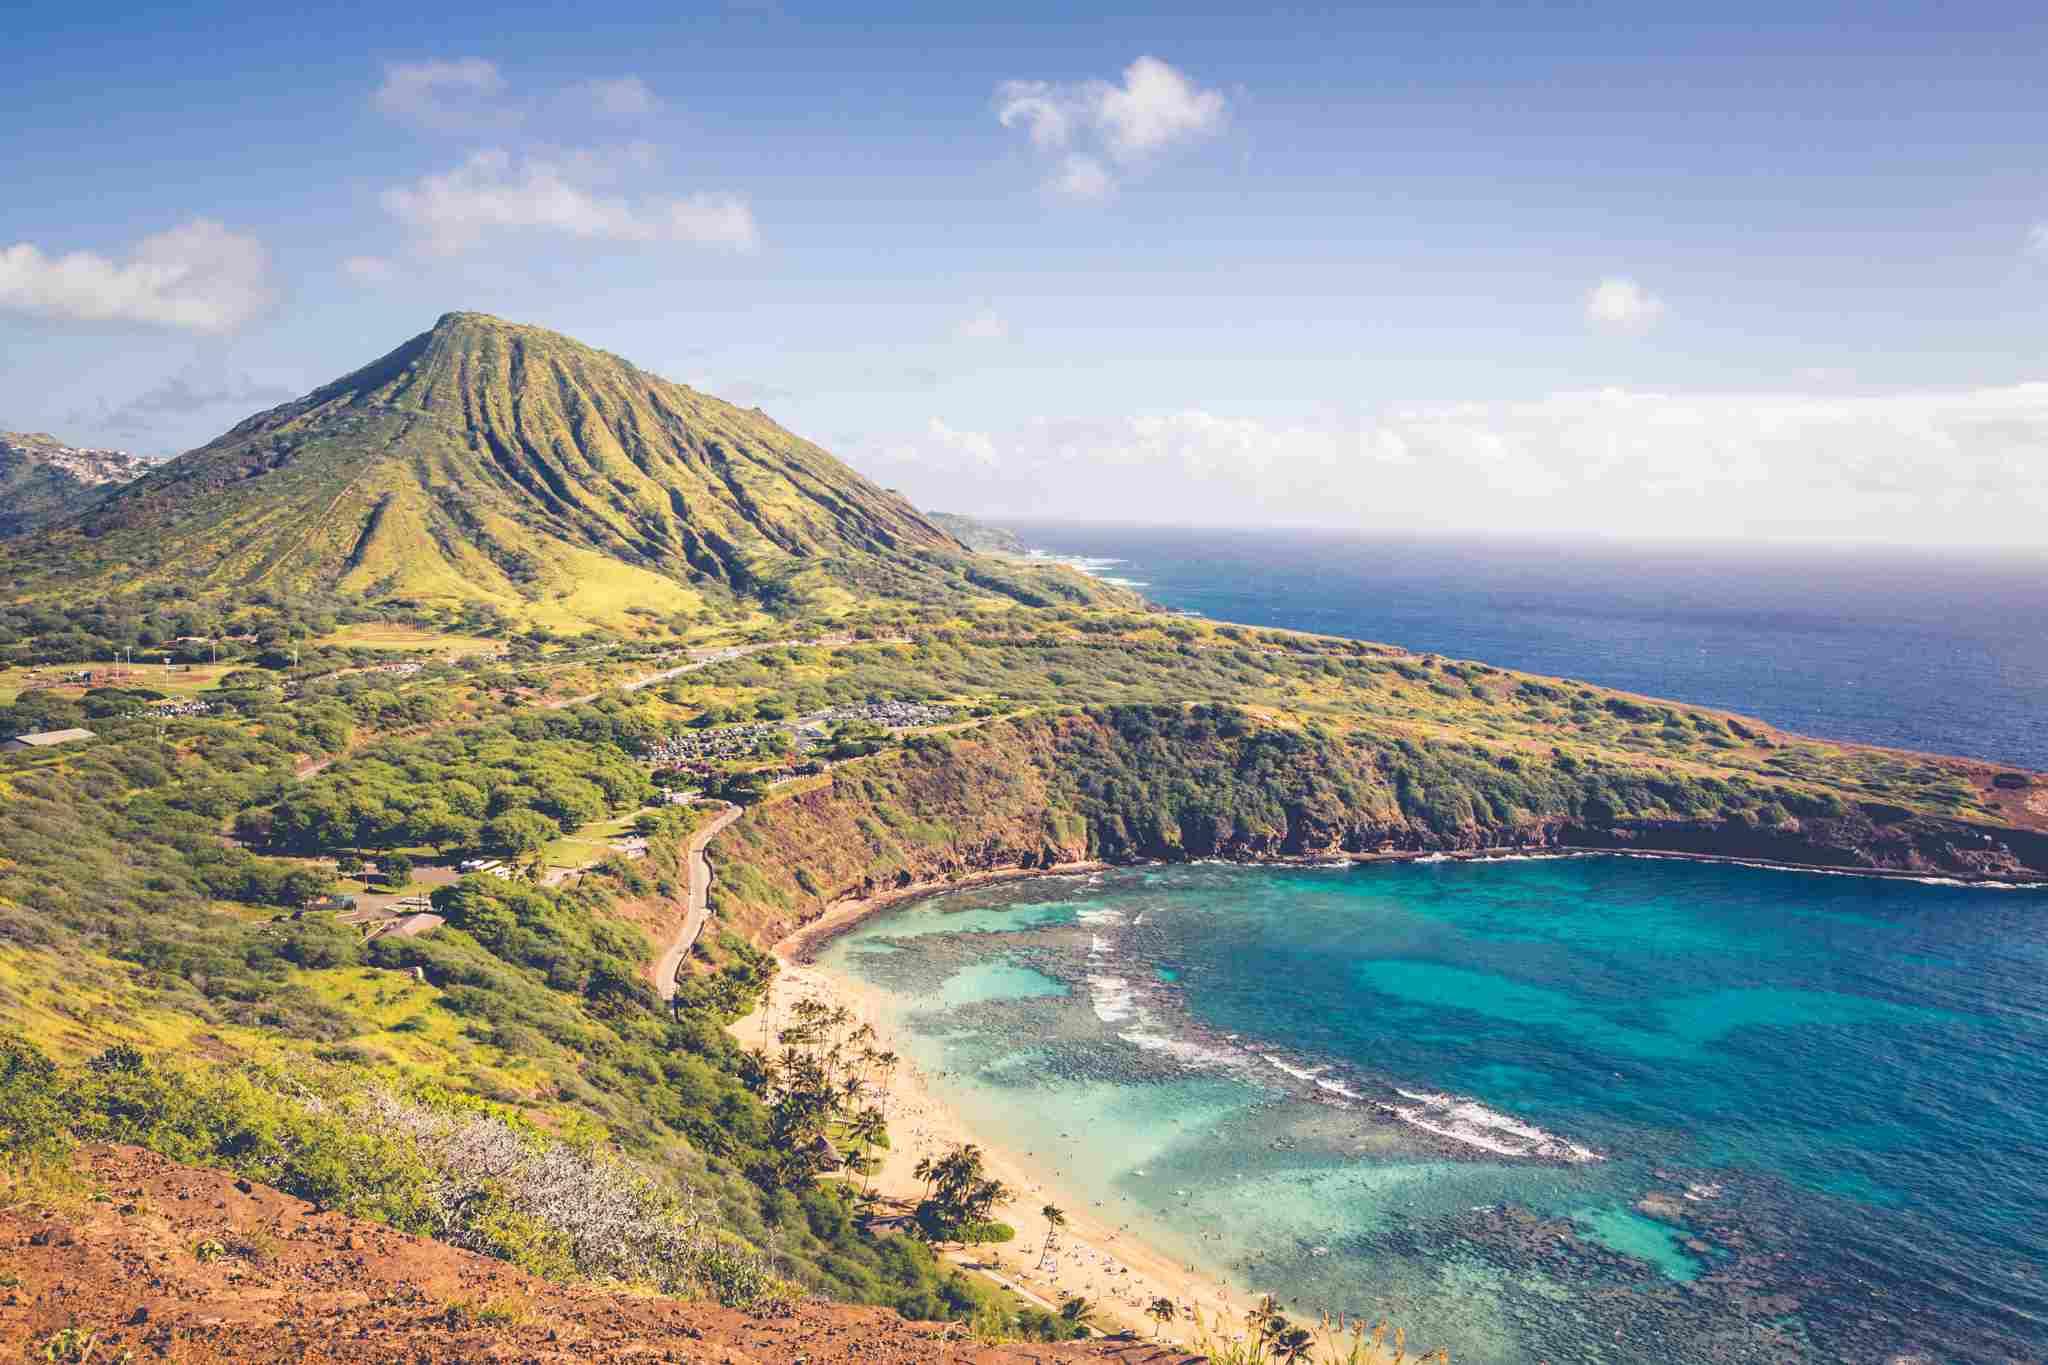 Scenic view of an Oahu beach